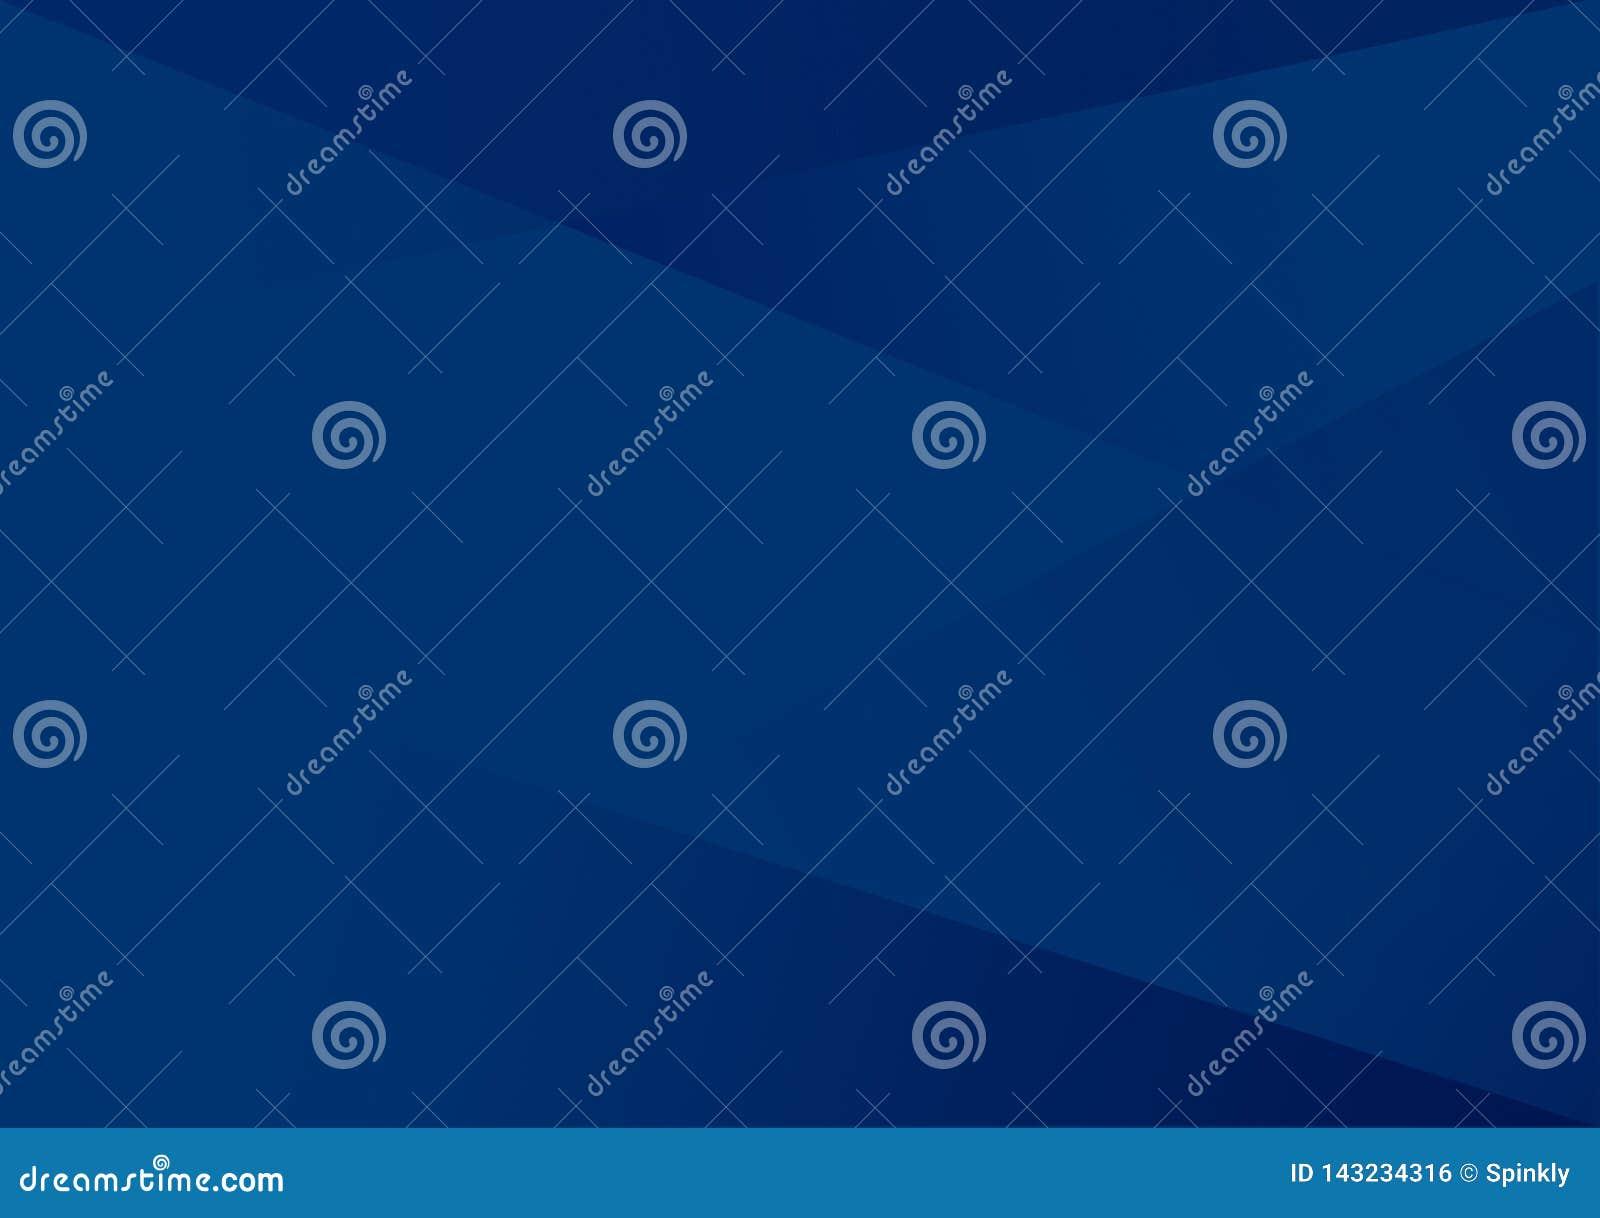 Blue linear shape background gradient background